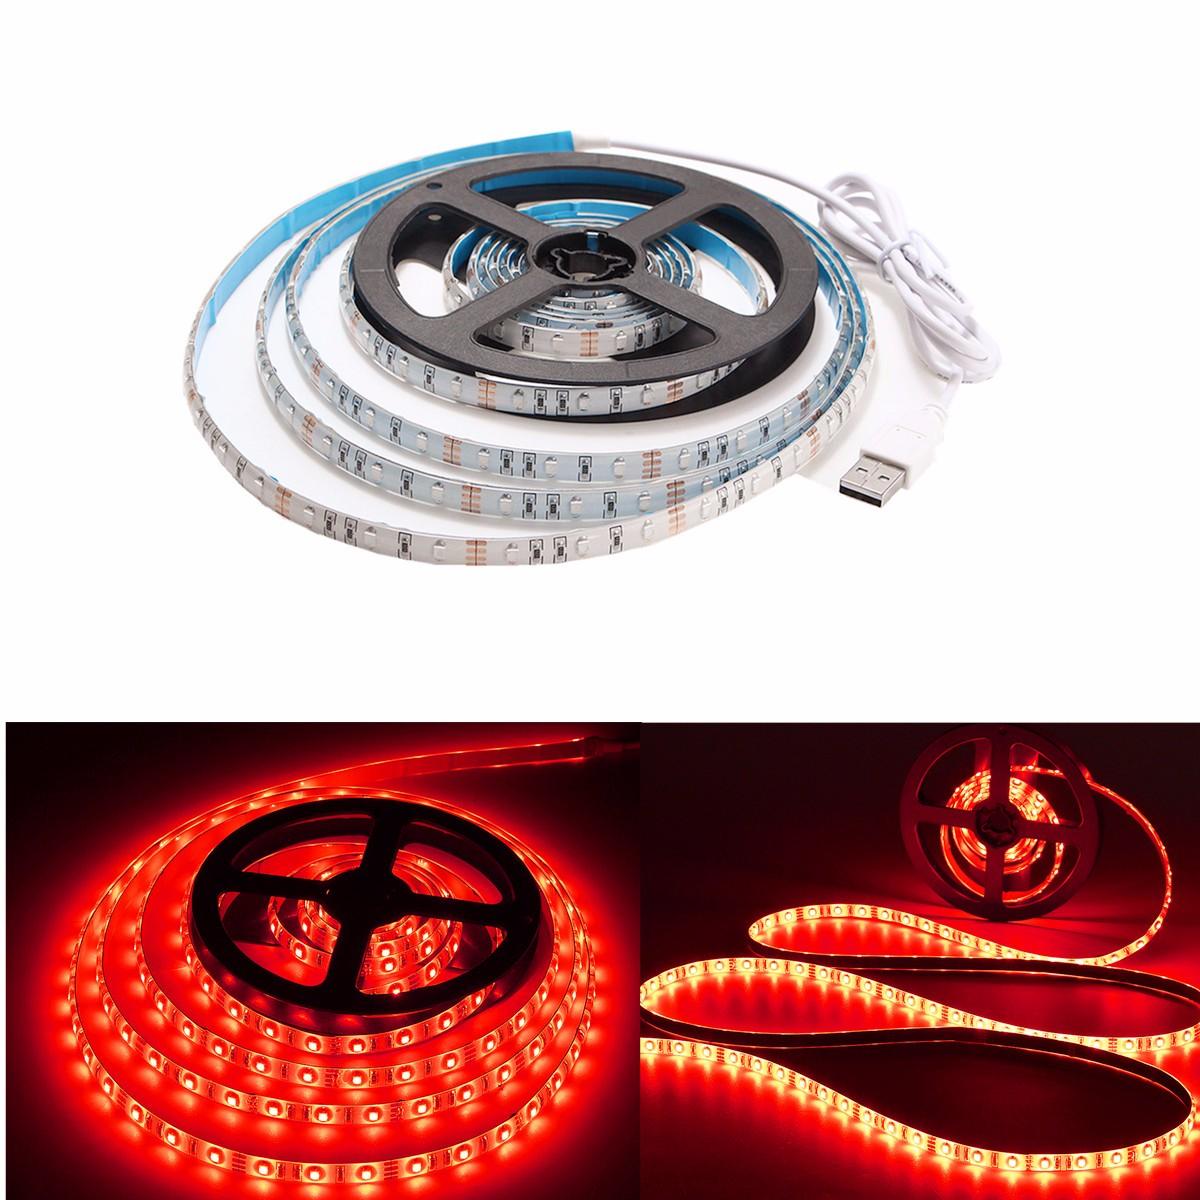 300CM-USB-LED-3528-SMD-Bande-Strip-TV-PC-Guirlande-Lampe-Noel-Fete-Decor-Etanche